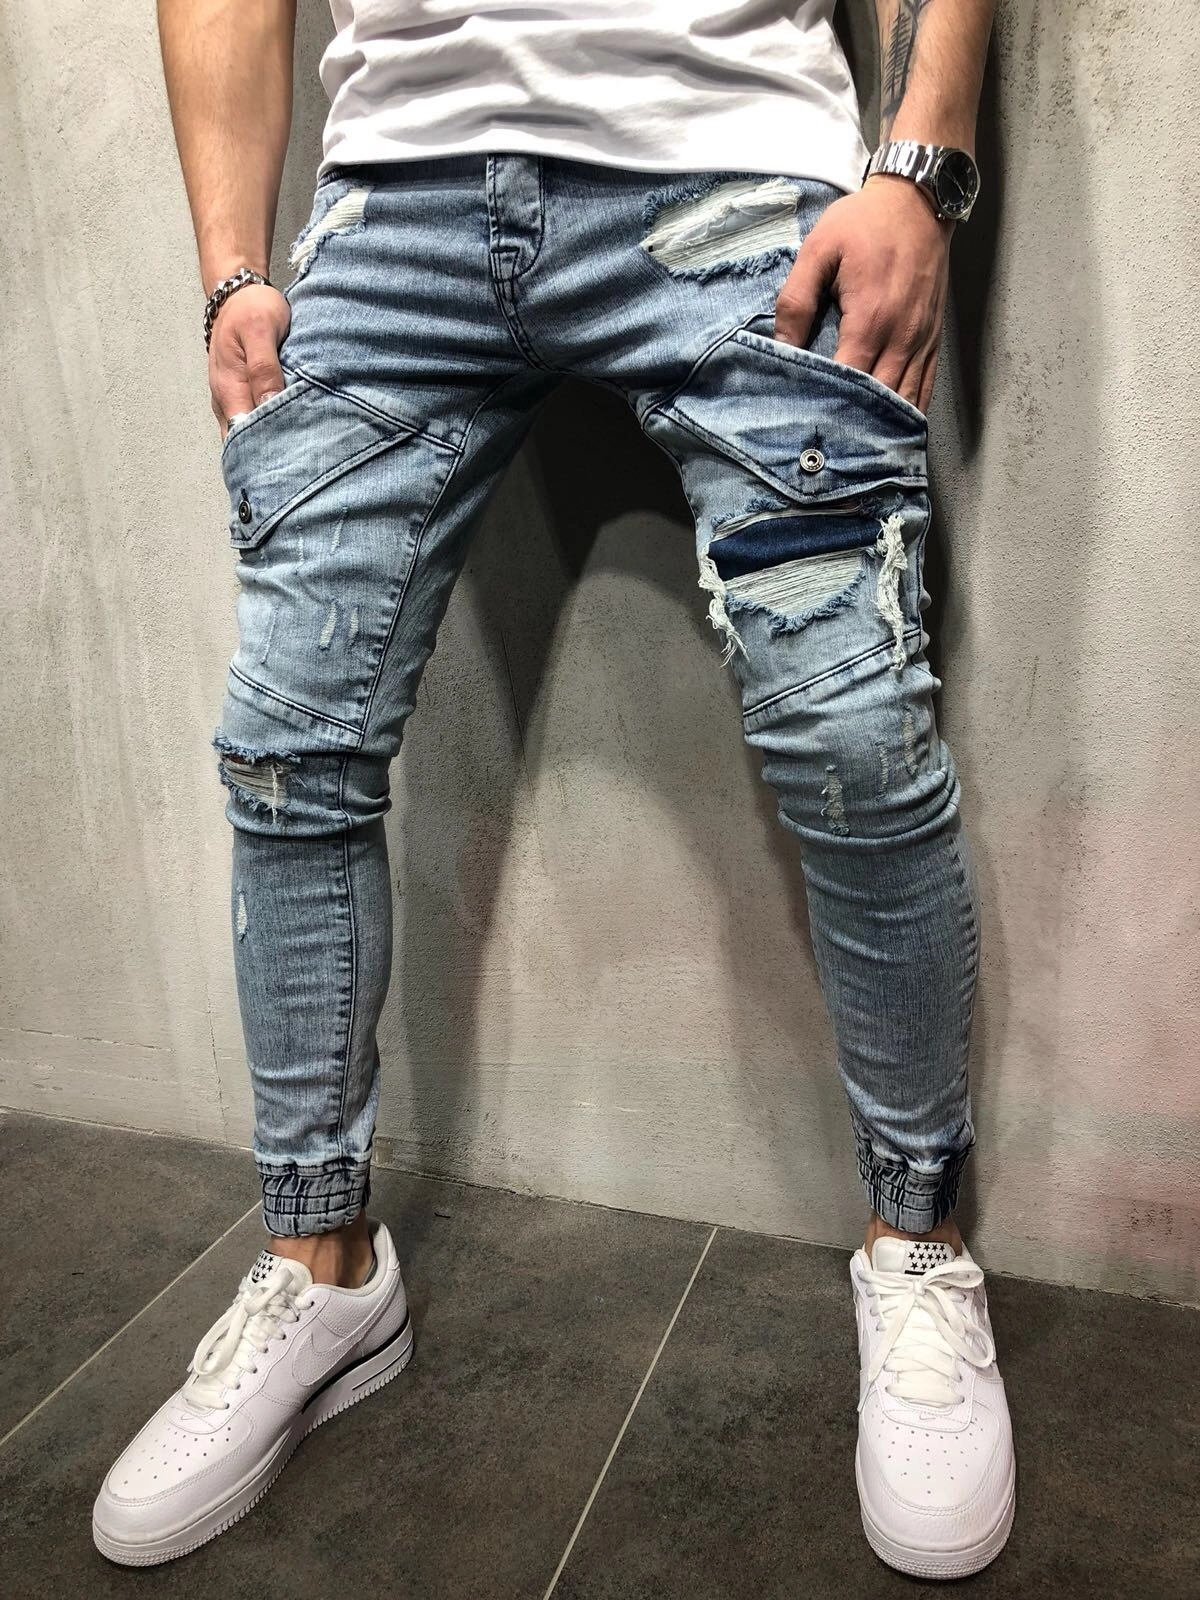 New Style With Holes MEN'S Jeans Slim Fit Zipper Retro Beam Leg Skinny Pants Fashion Man Jeans